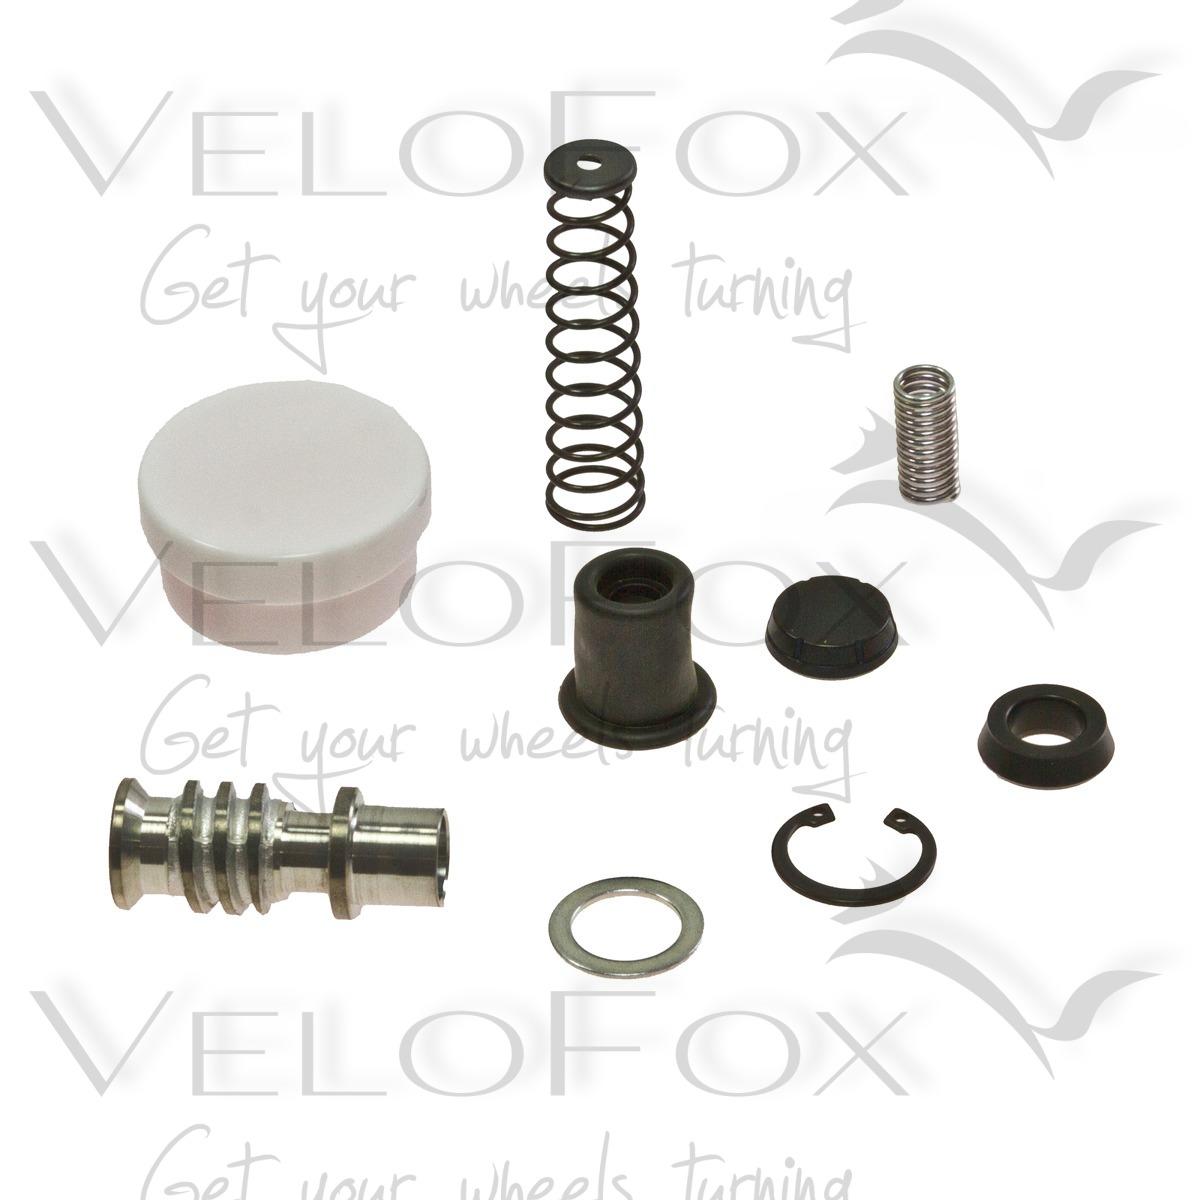 Clutch Master Cylinder Repair Kit fits Yamaha VMX-12 1200 Vmax 1996-2002